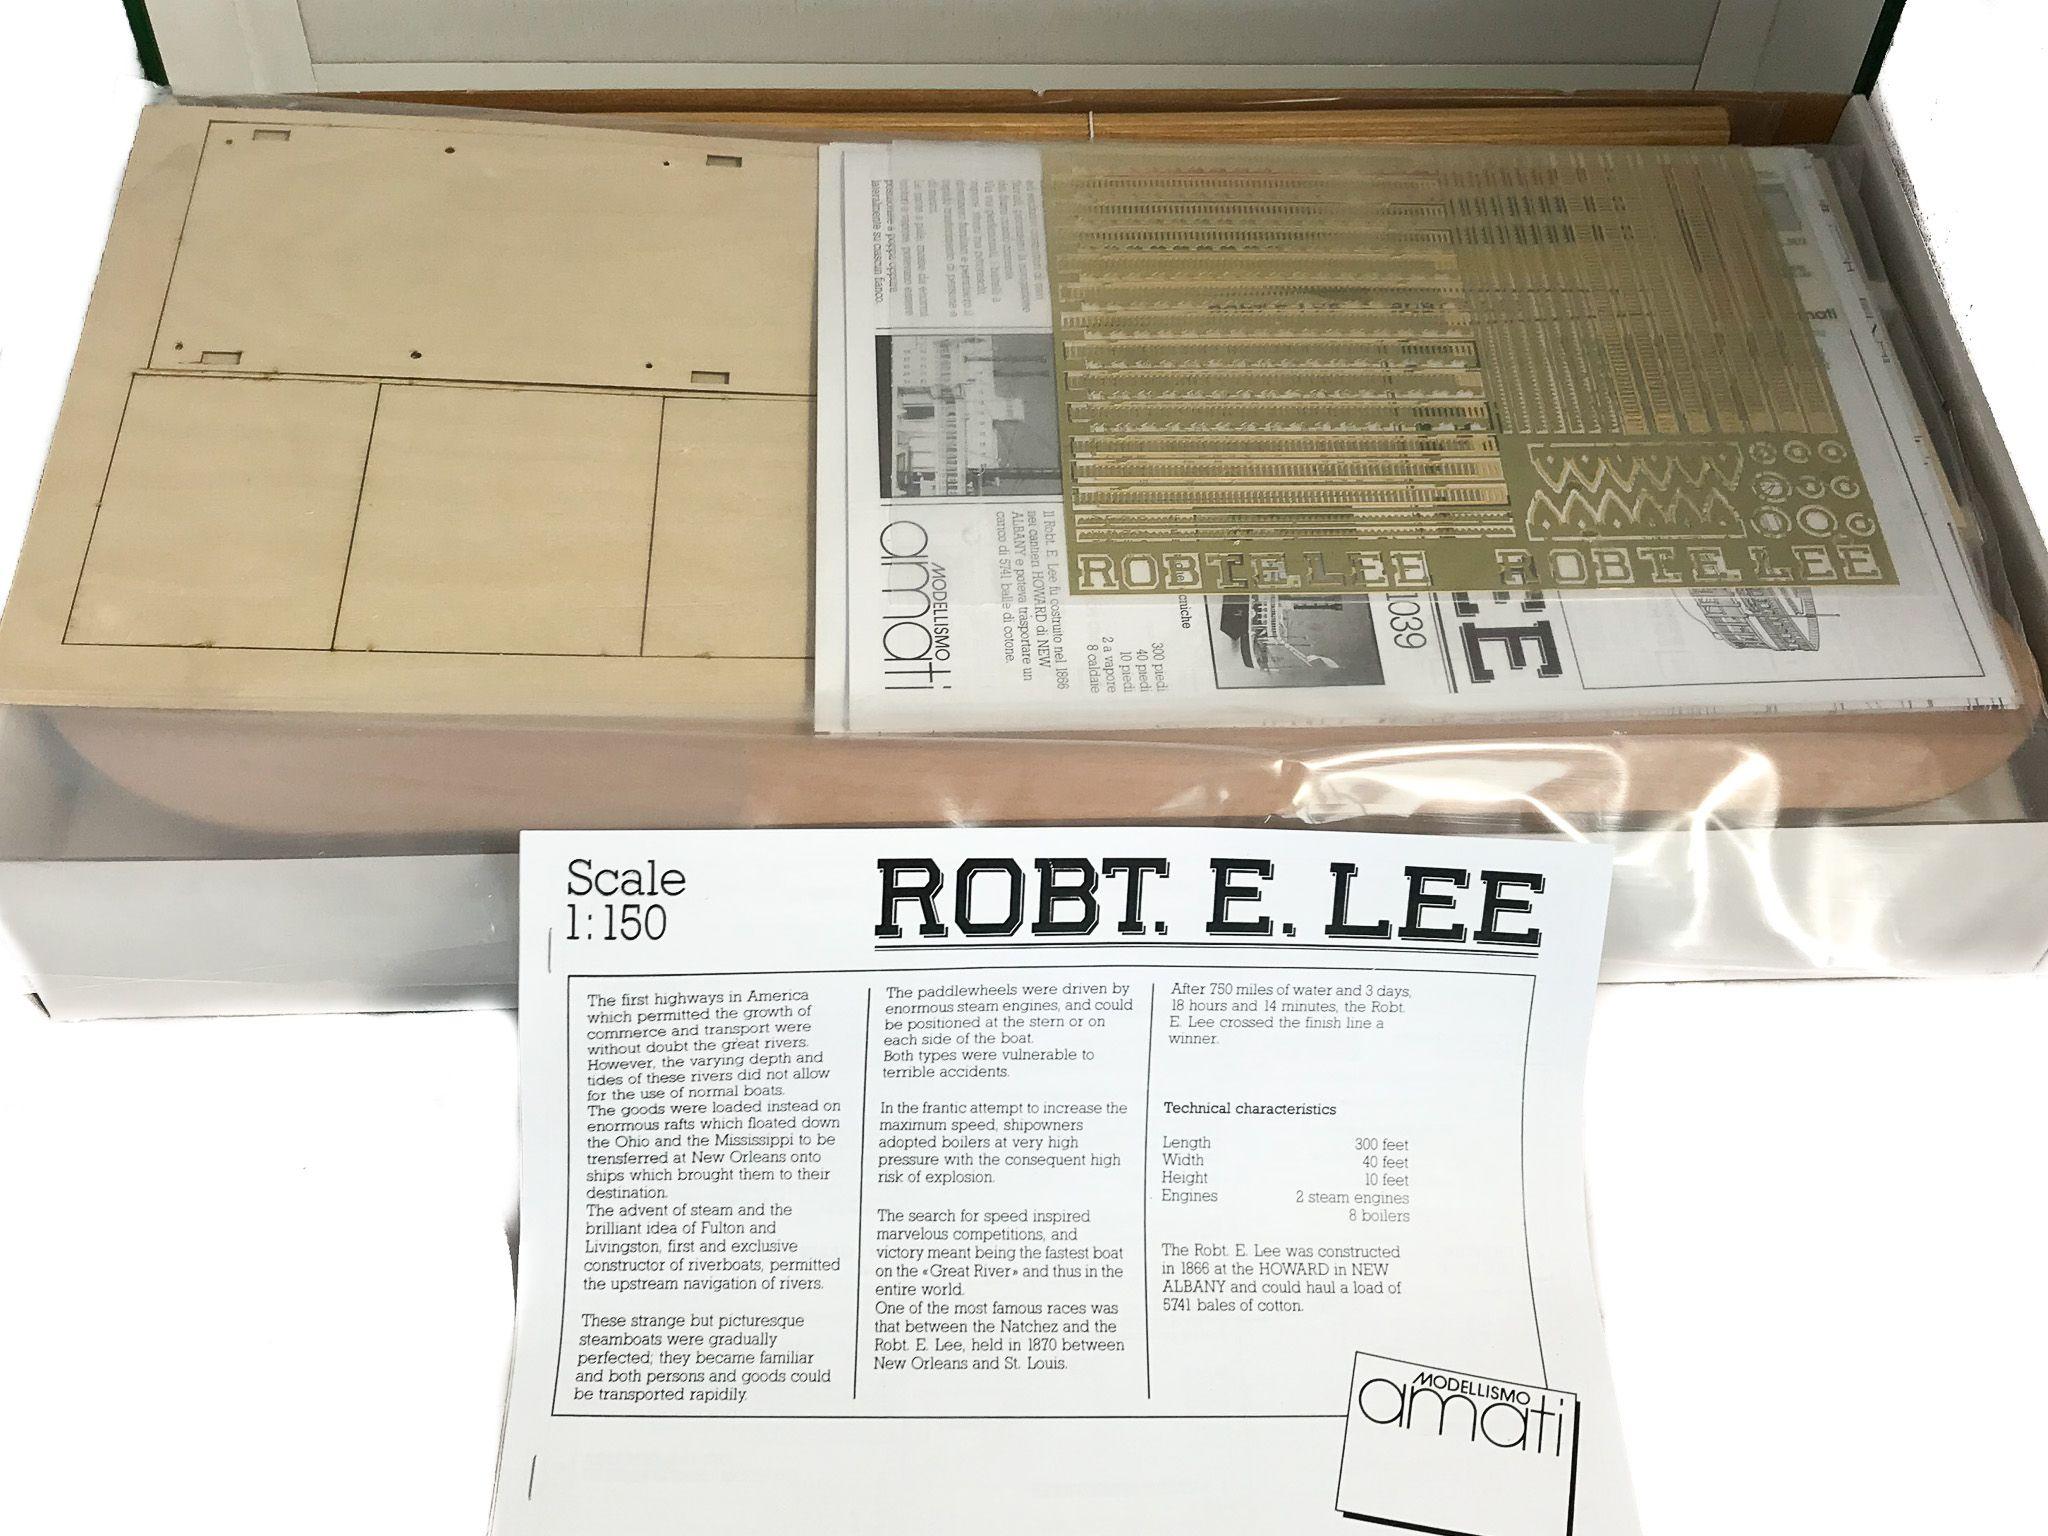 366-13379-Robert-E-Lee-Model-Boat-Kit-Amati-1439